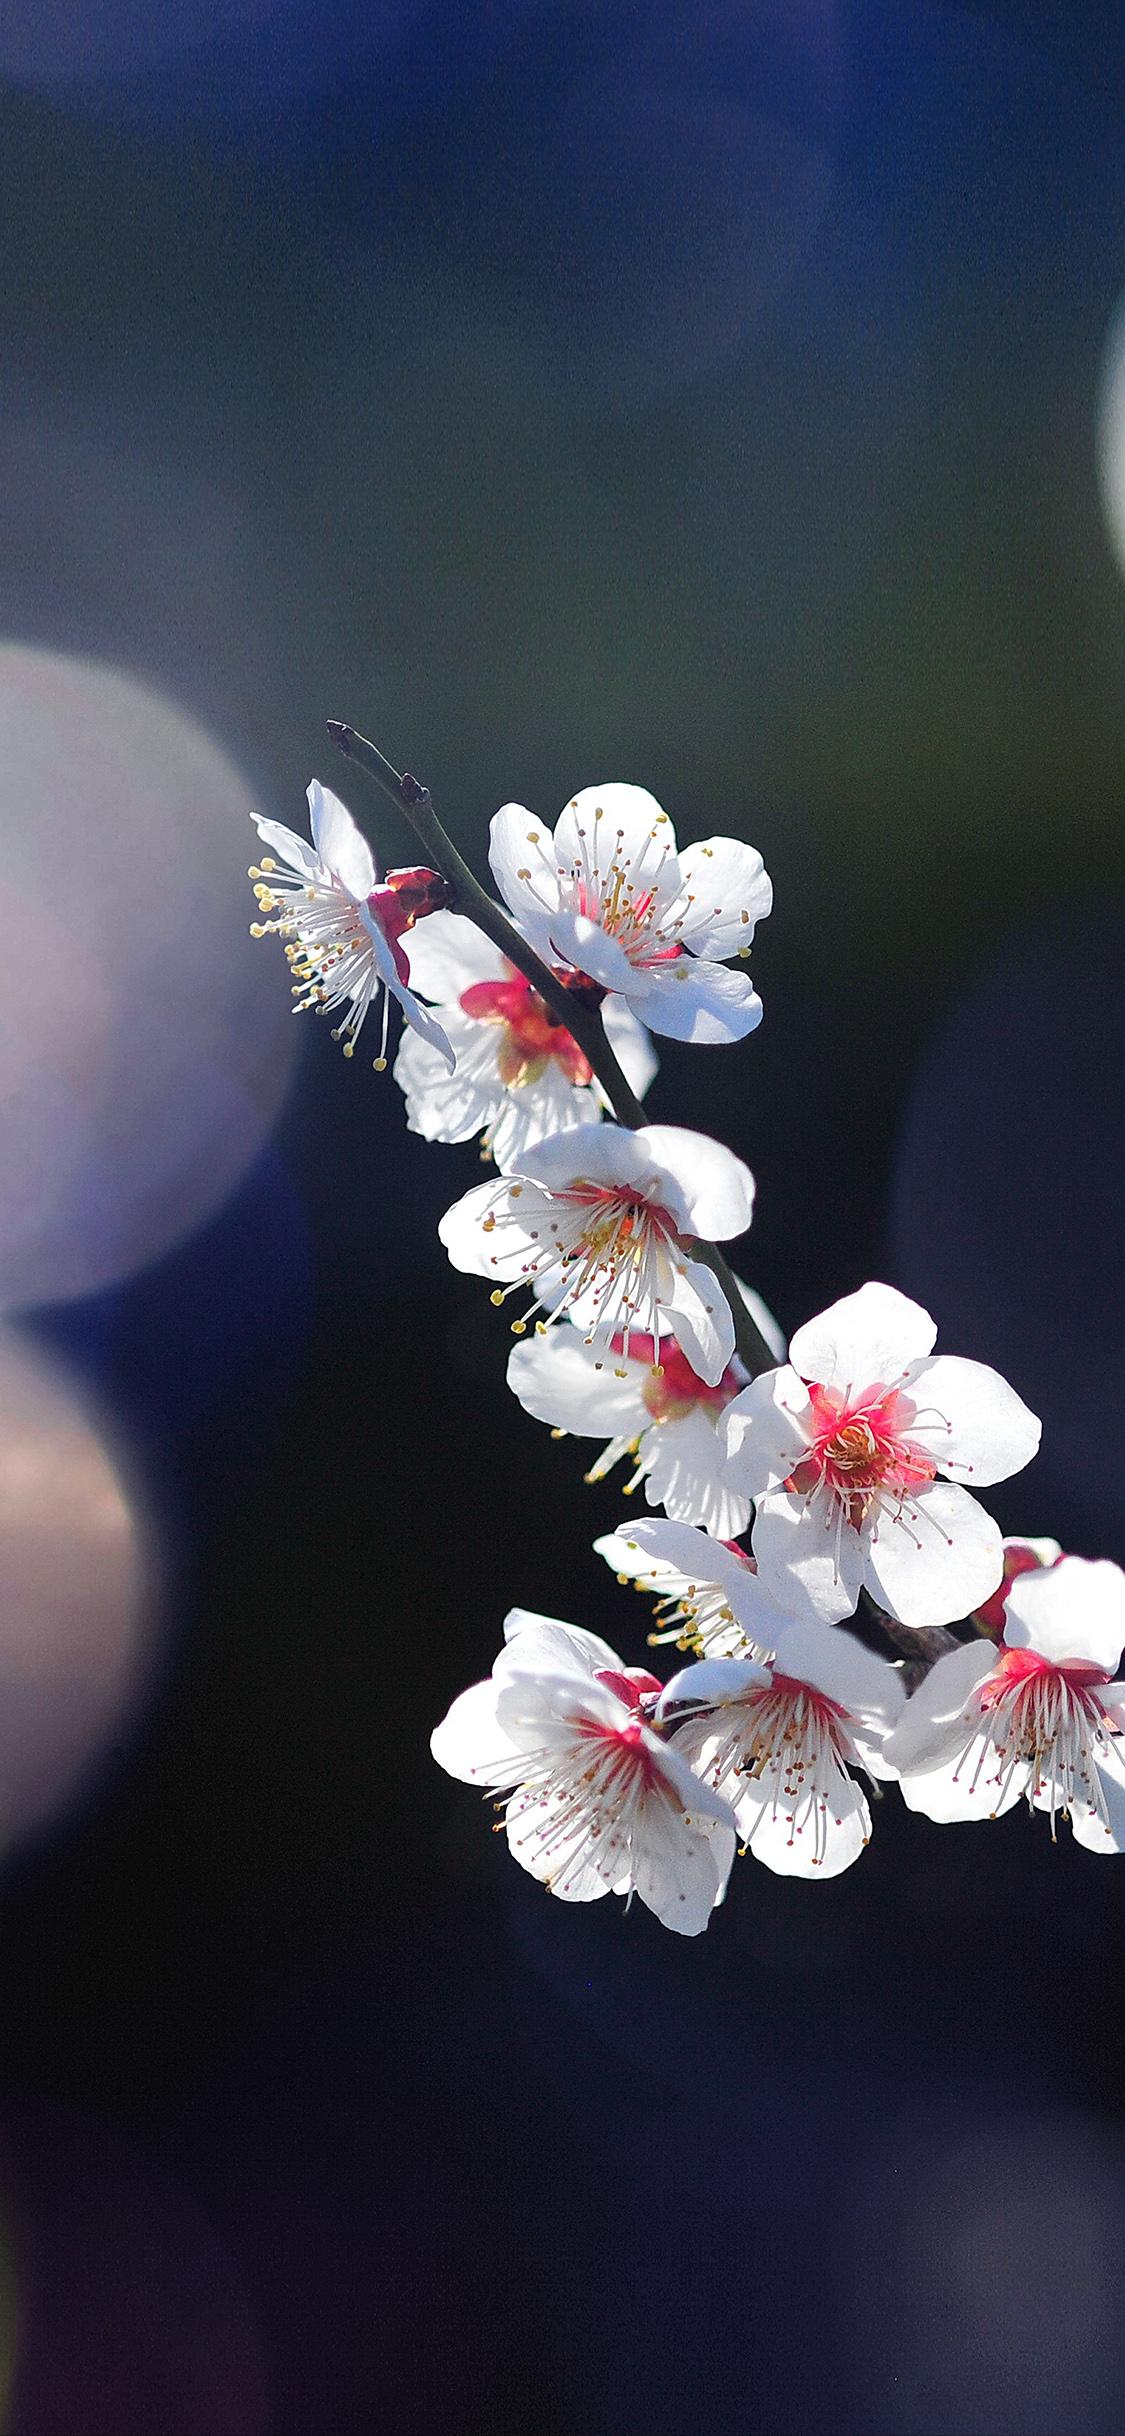 60 Wallpaper Flowers Images On Wallpapersafari